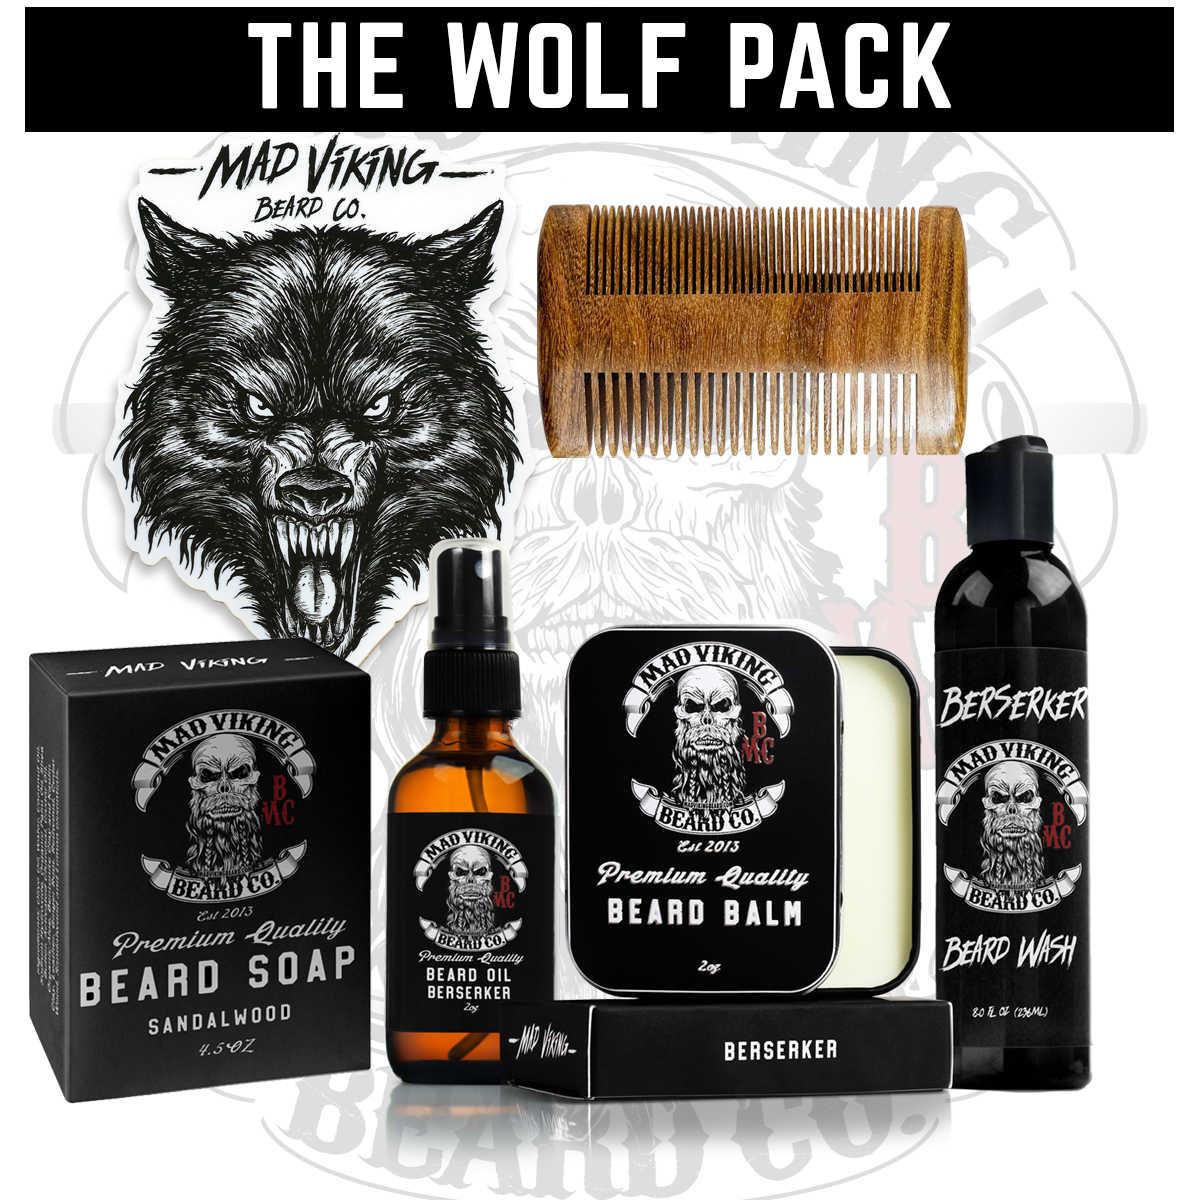 Mad Viking Wolf Pack